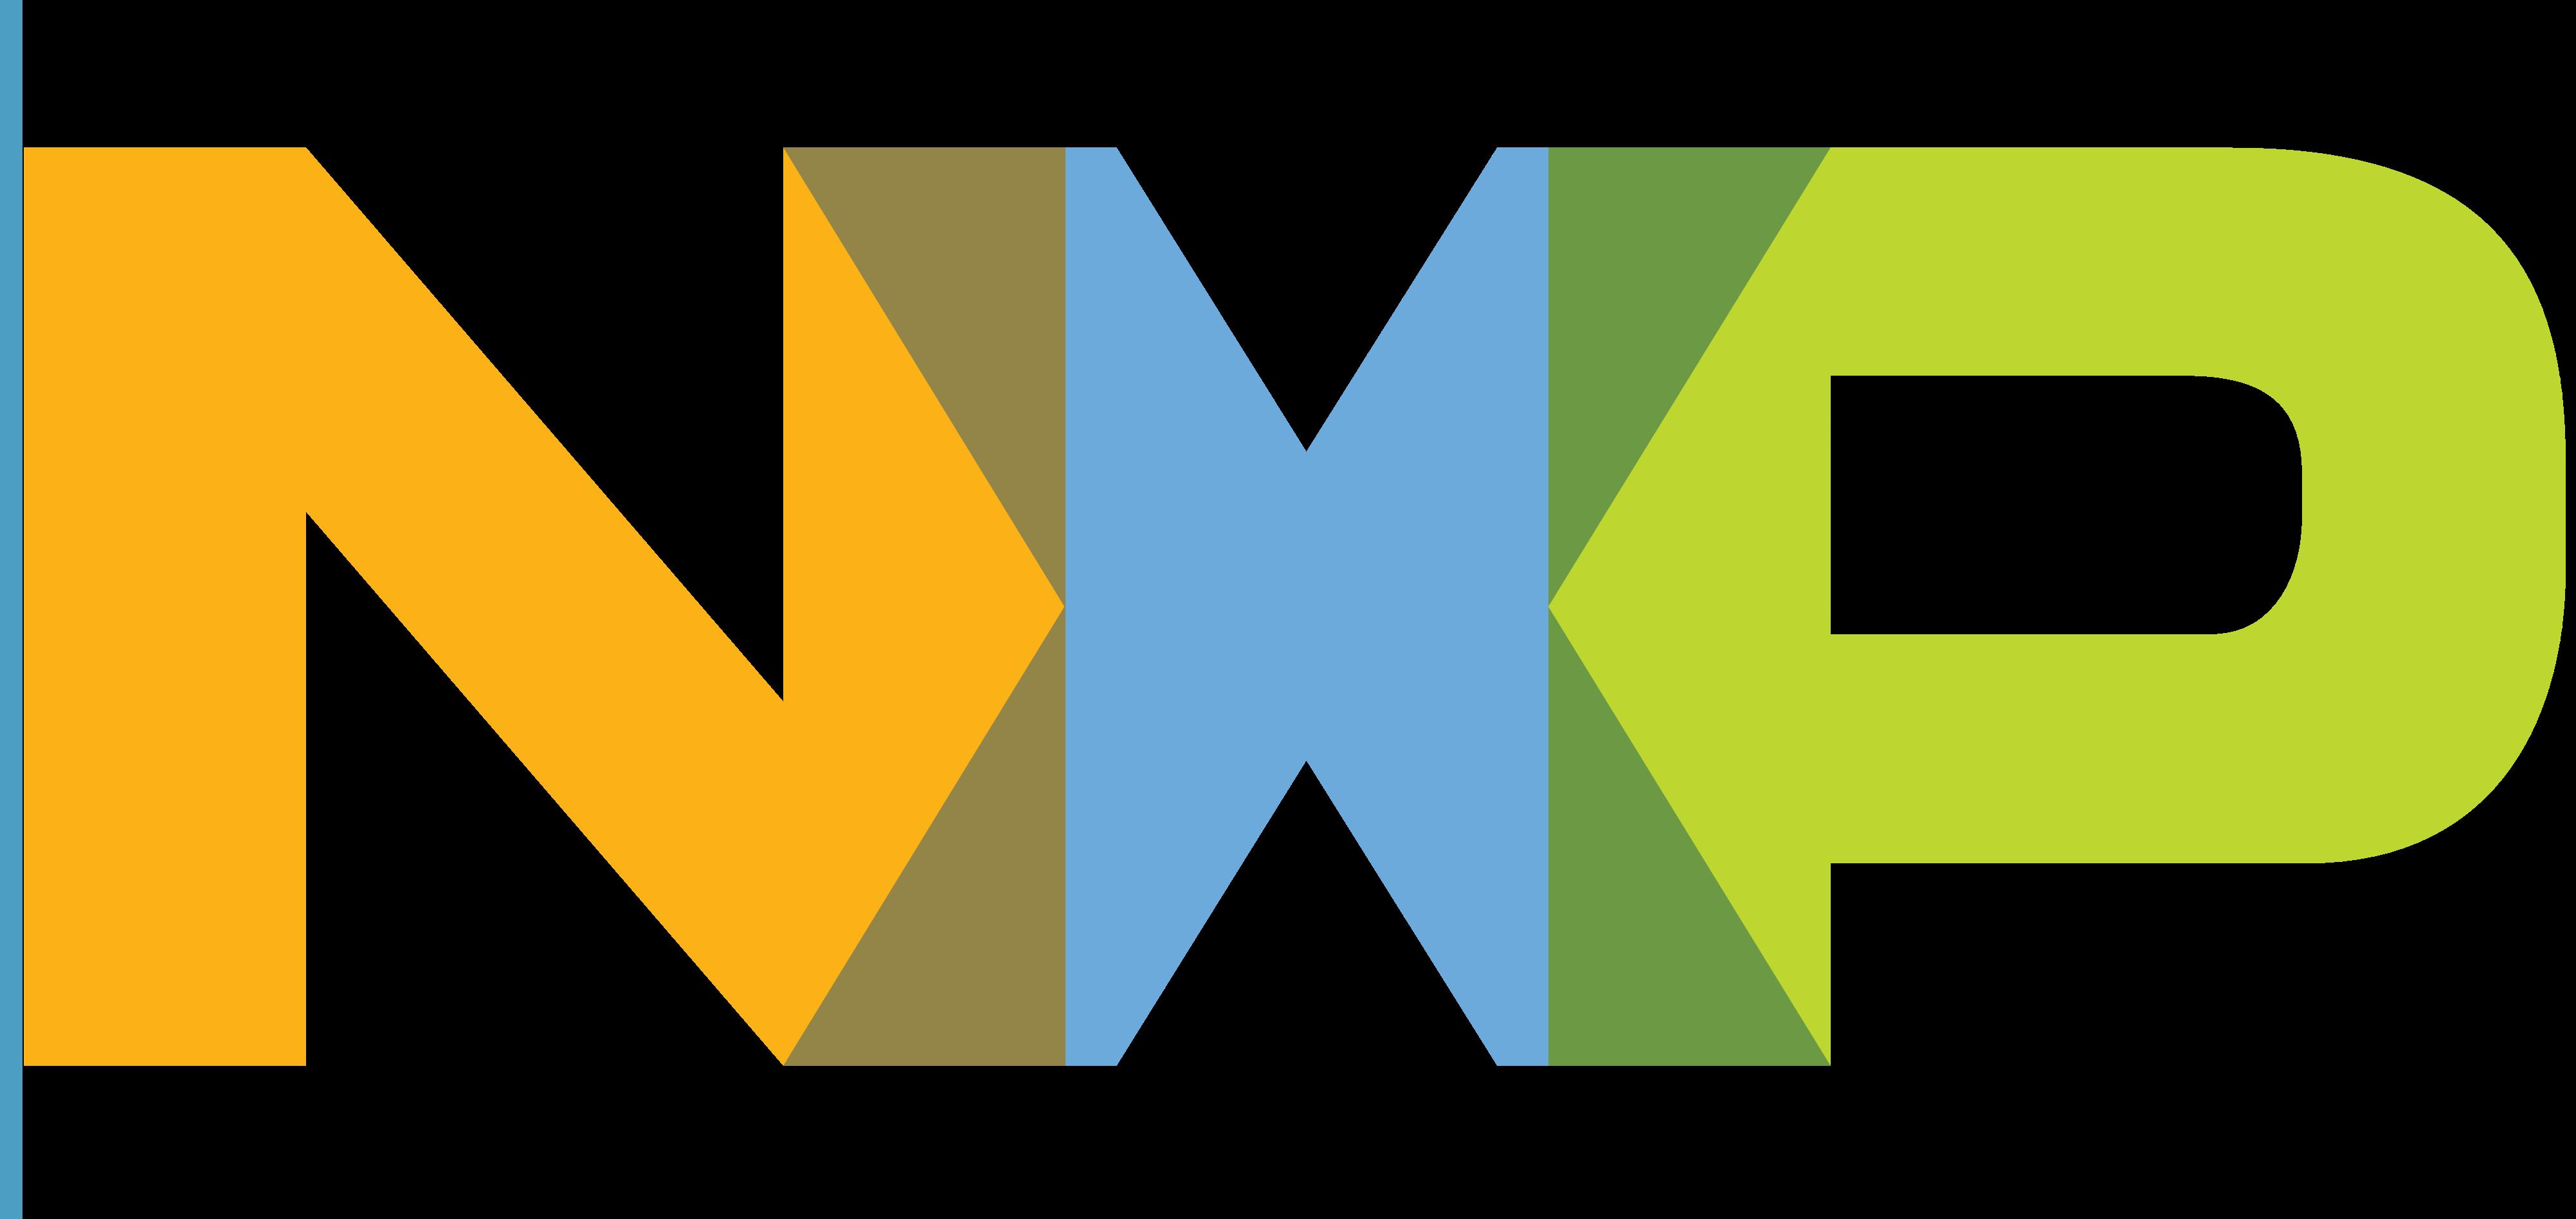 NXP_Semiconductors_logo